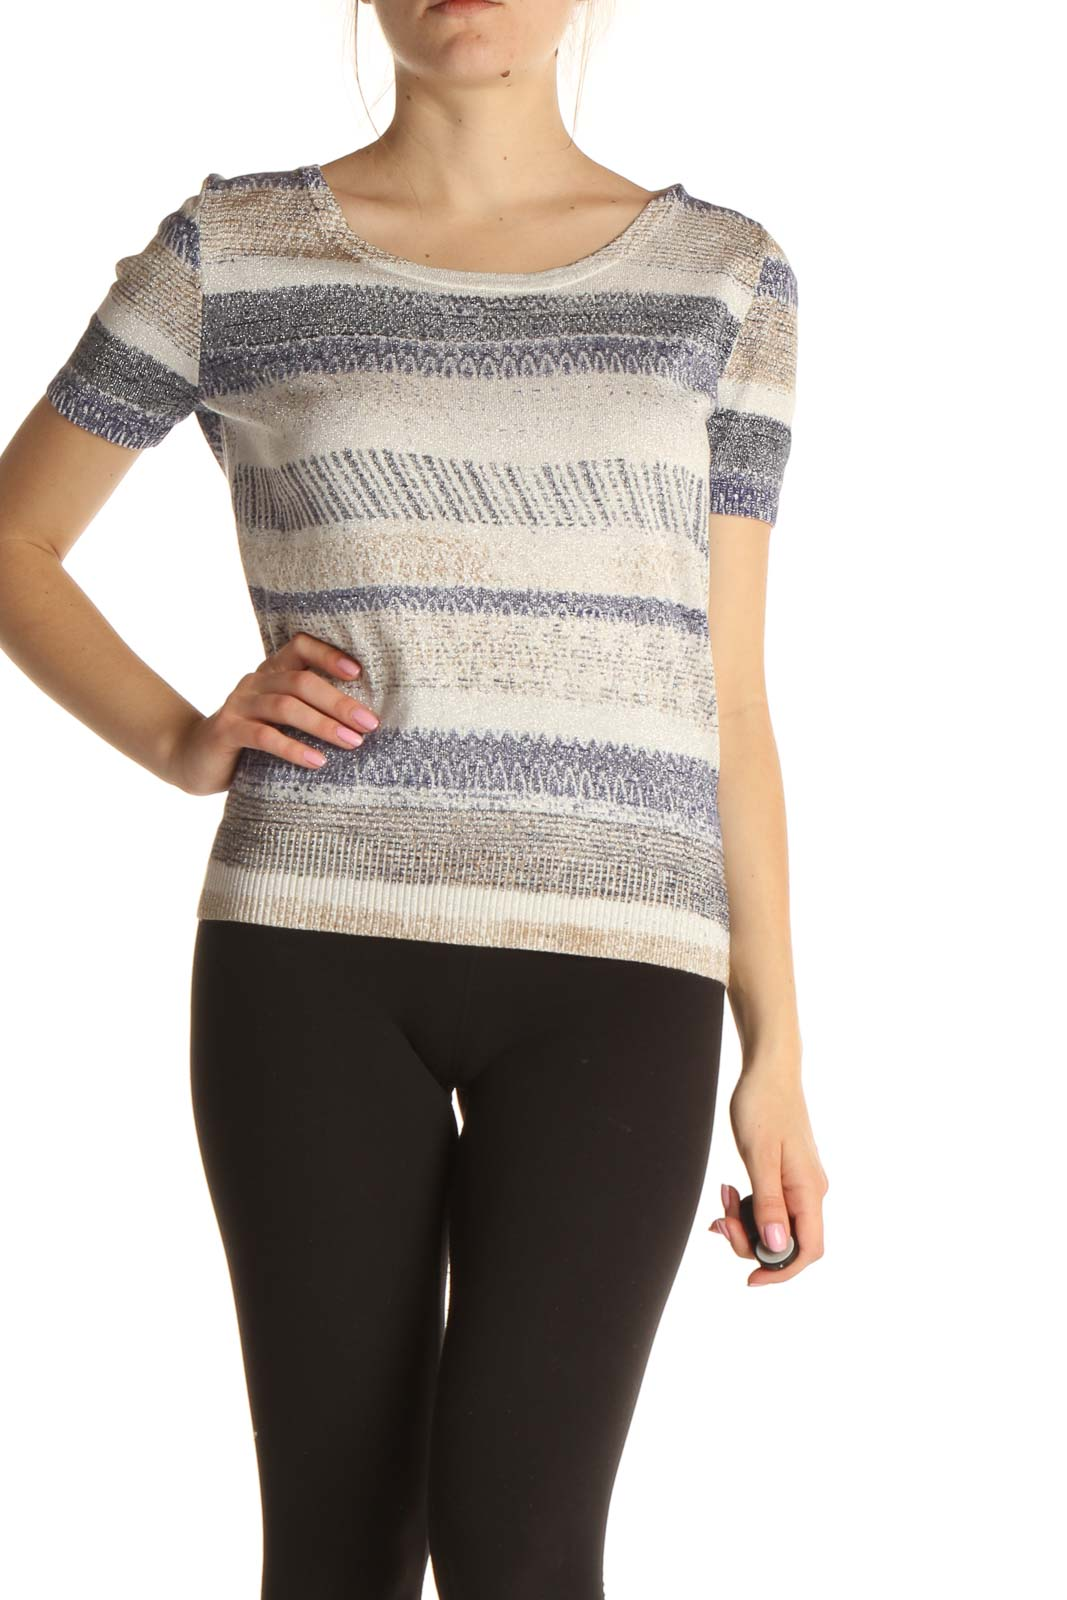 Beige All Day Wear Sweater Front